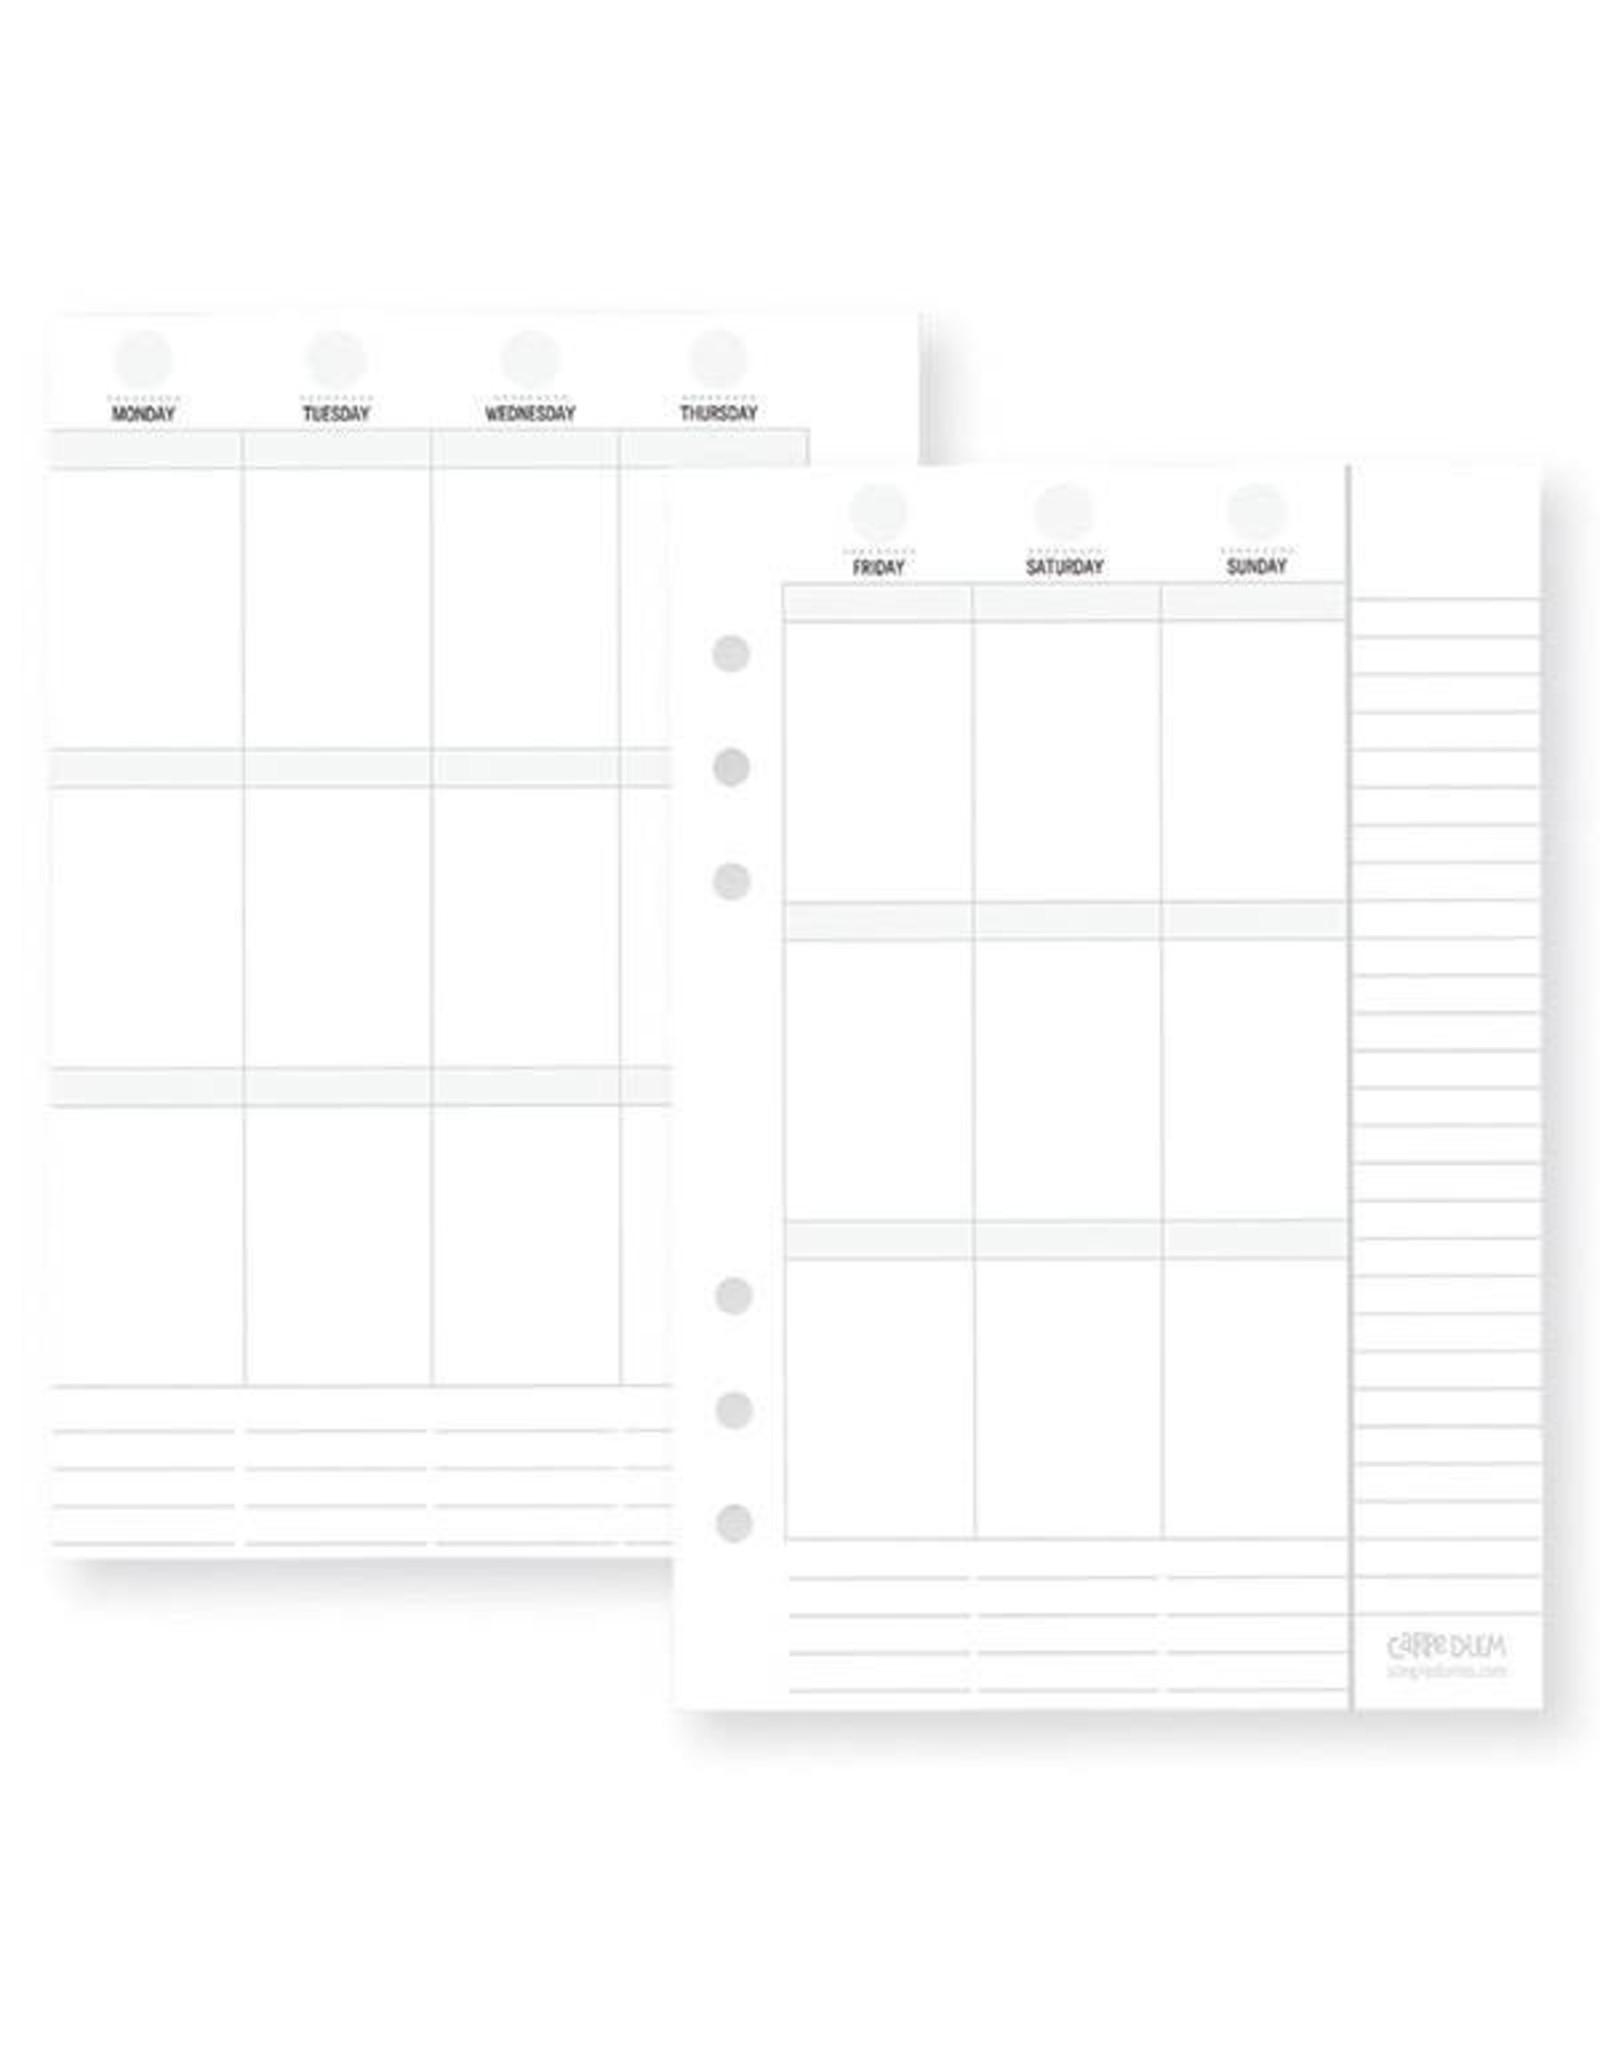 Carpe Diem Carpe Diem Planner Essentials A5 Vertical Format Weekly Inserts